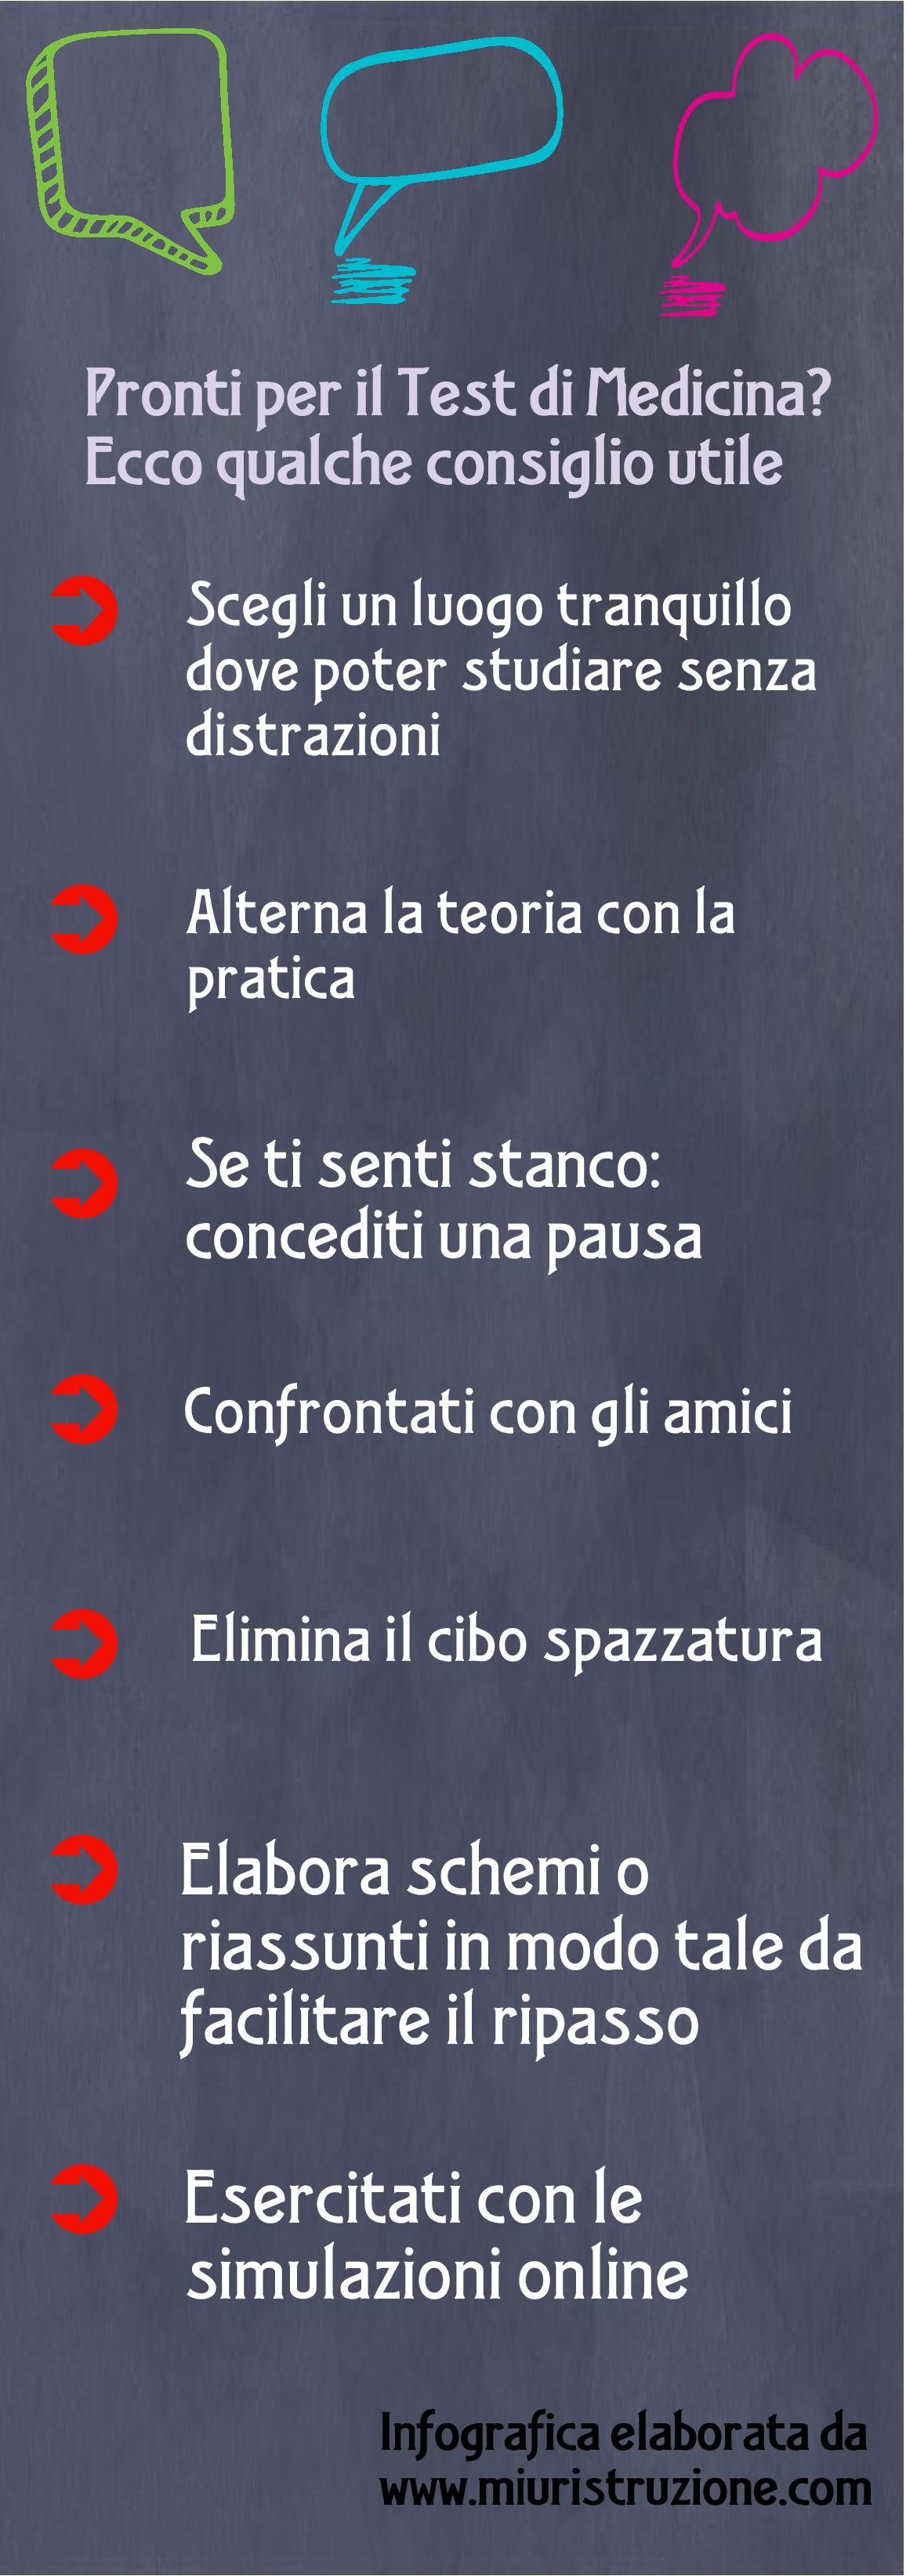 infograficamiur (1)-page-001